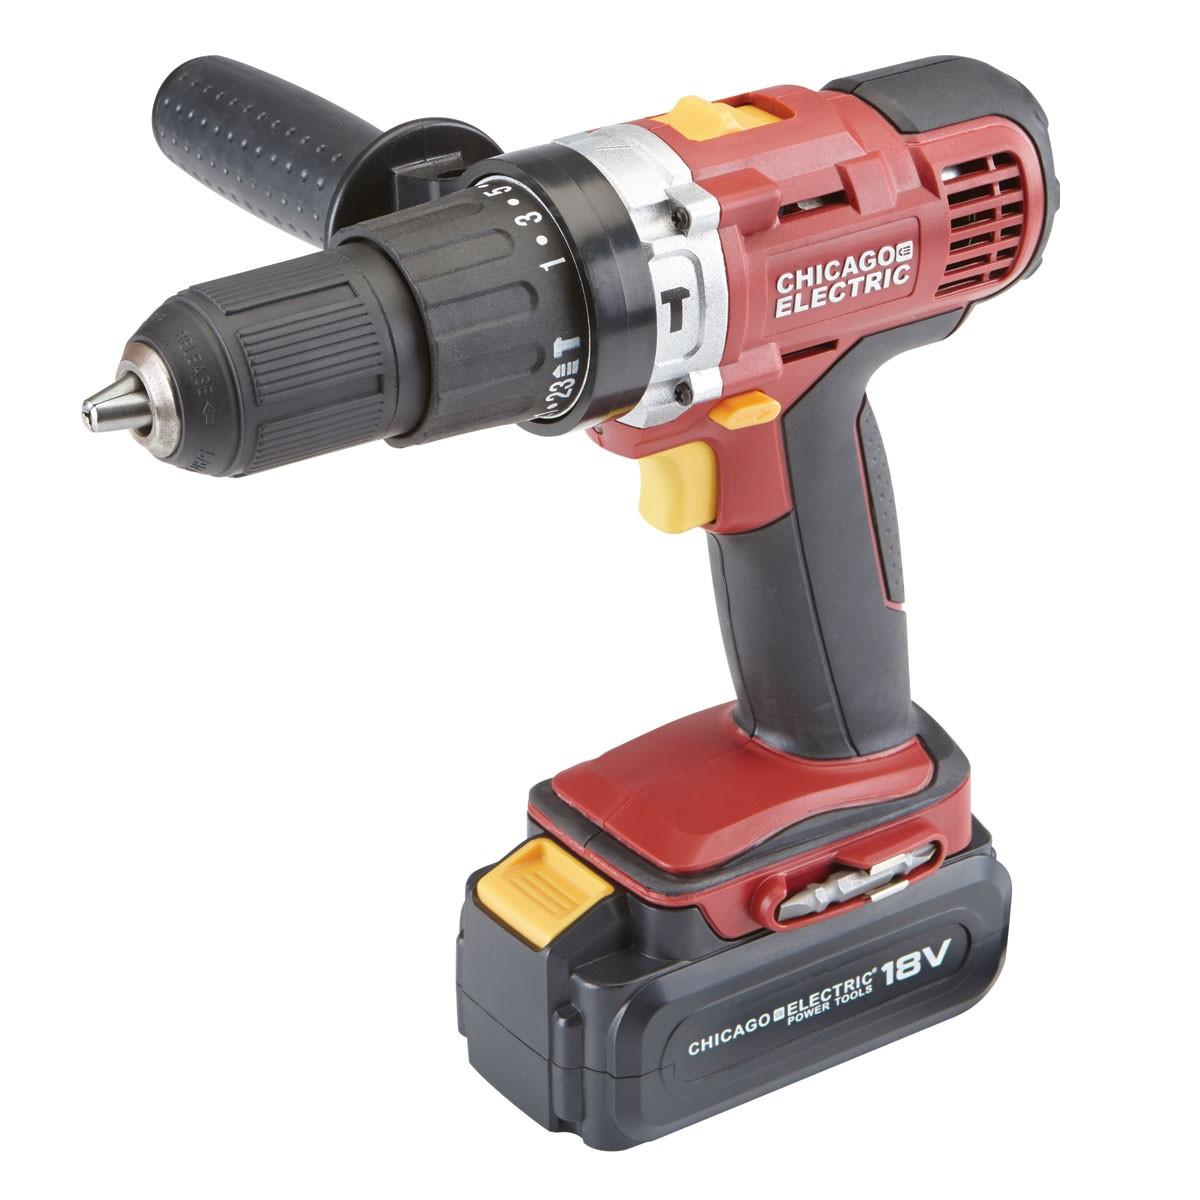 Chicago Electric 18v Drill Hammer